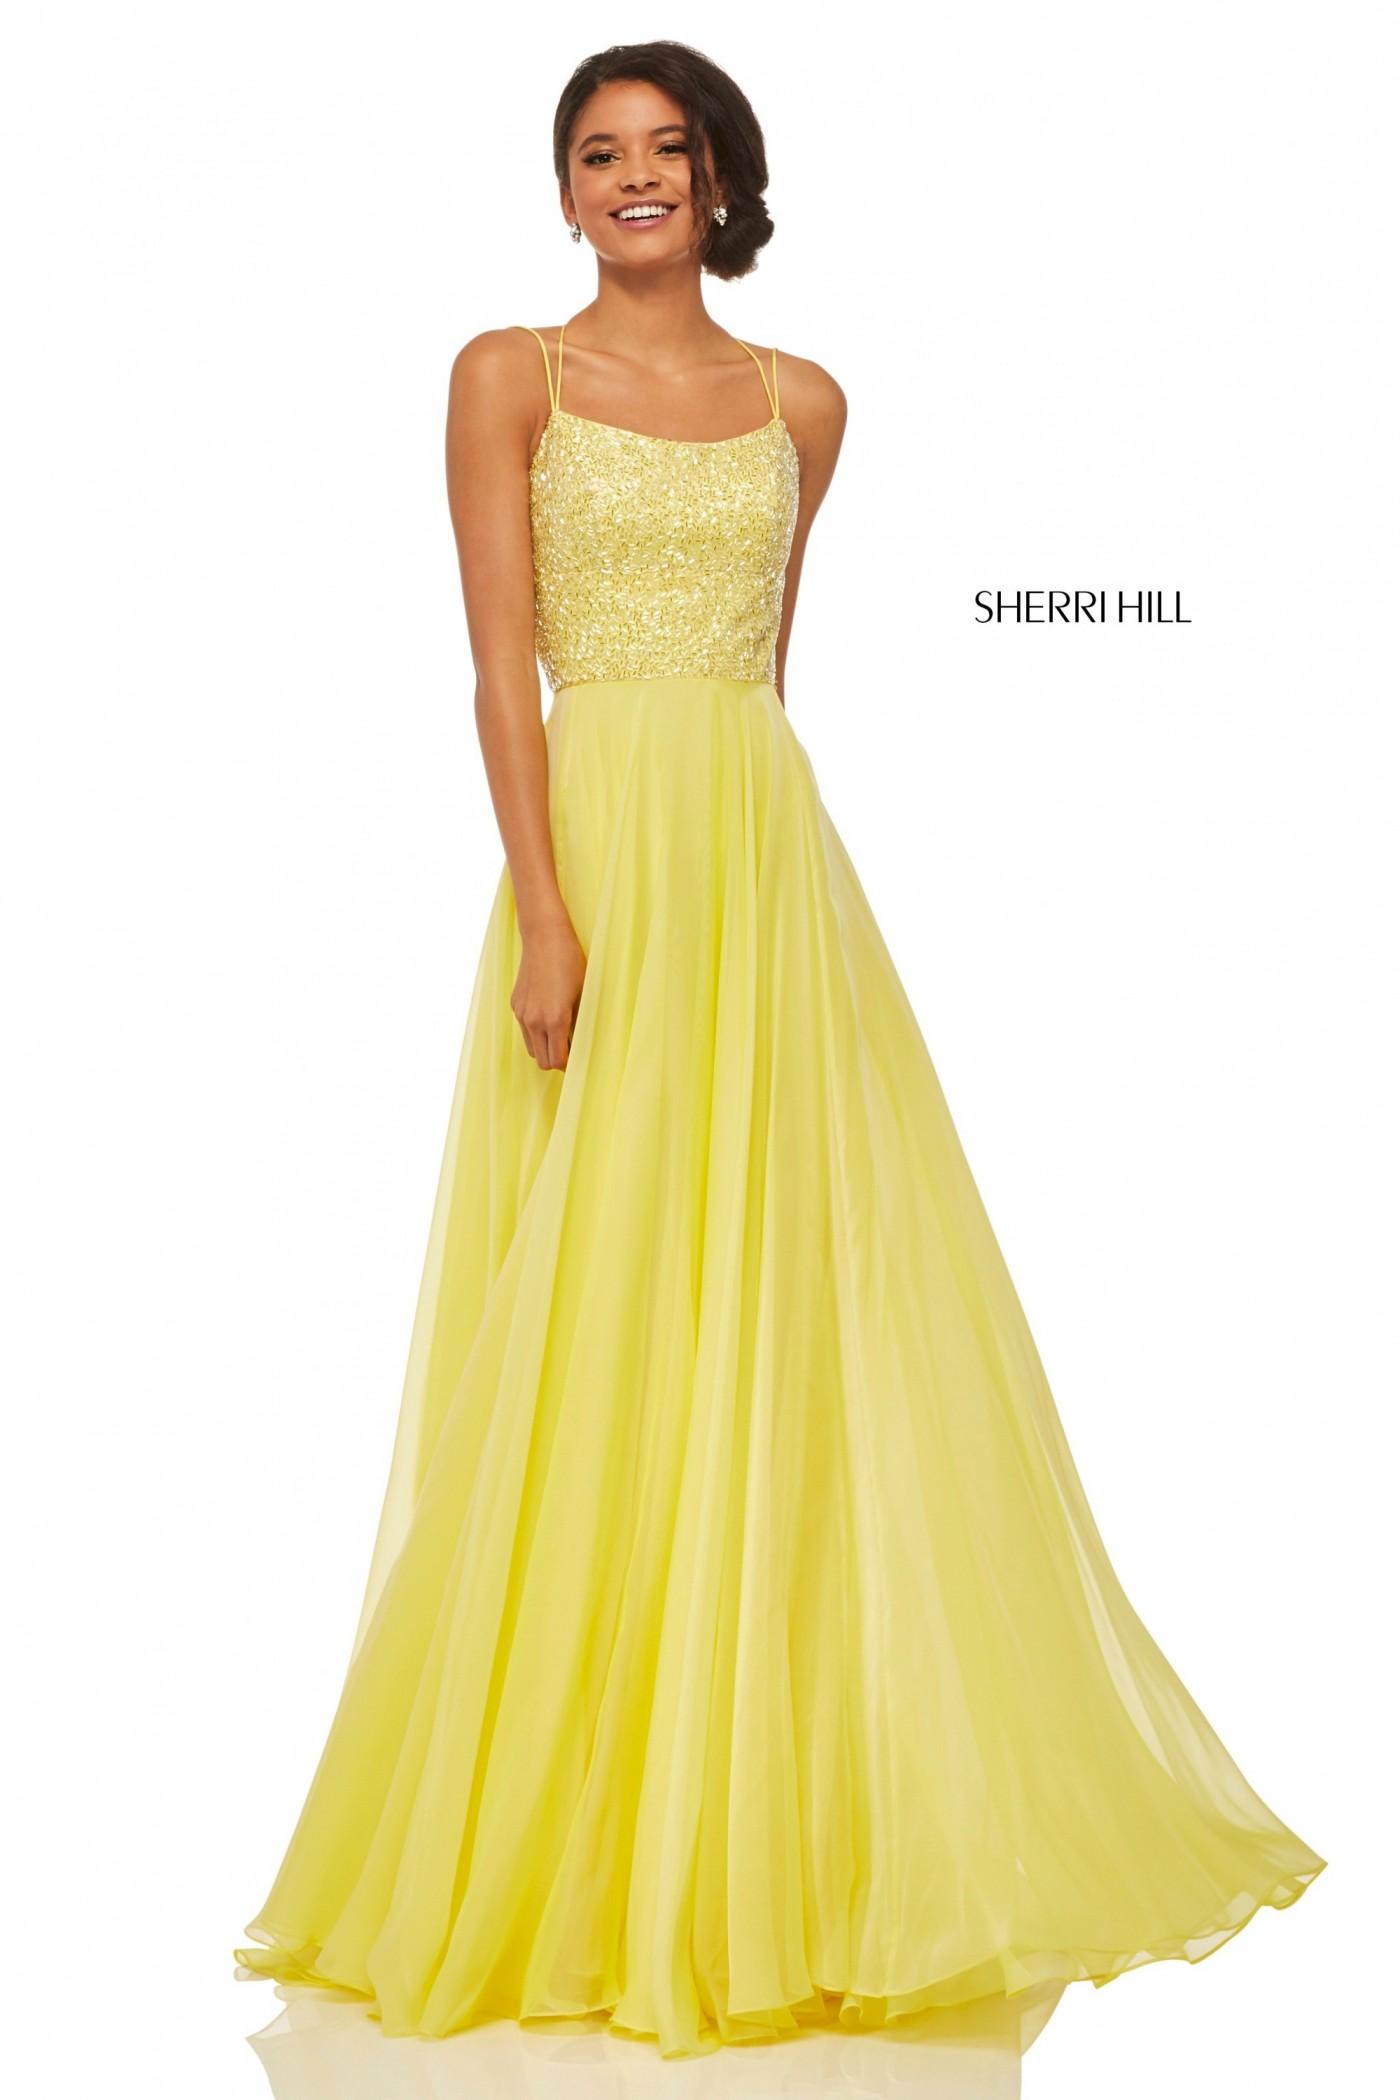 Sherri Hill 52591 Beaded Lace Up Back Chiffon Gown